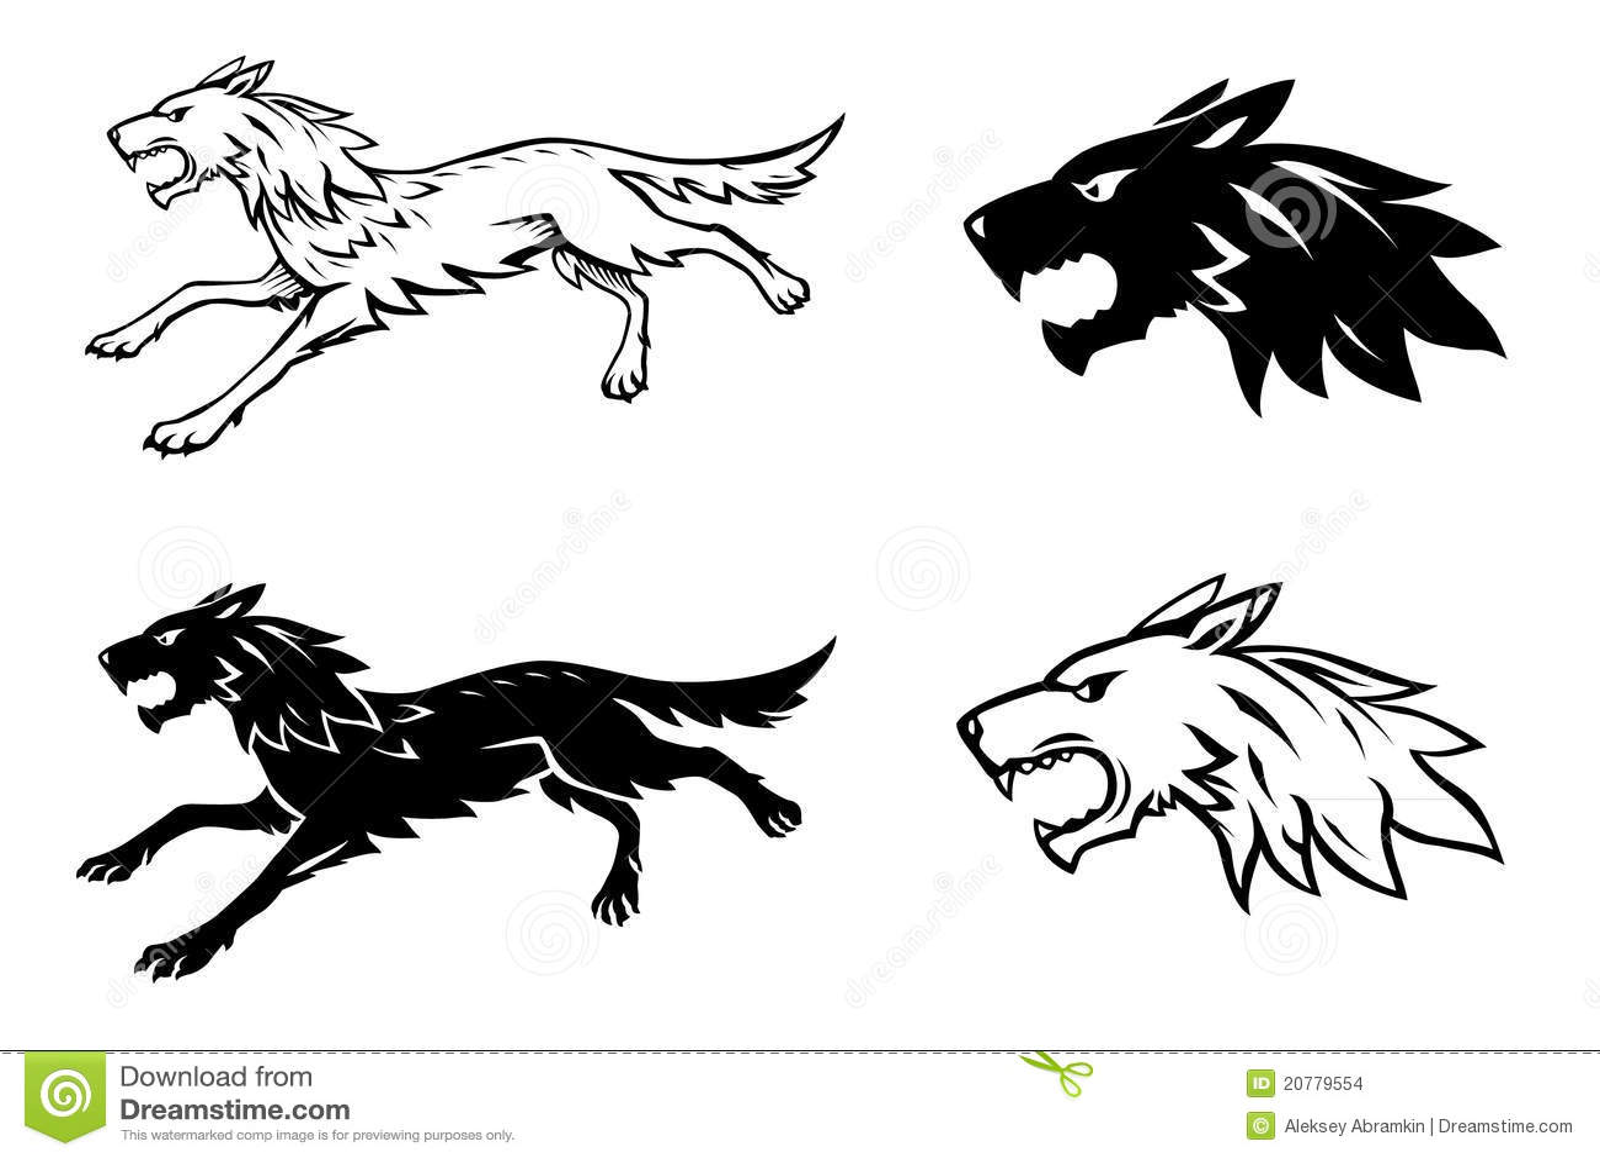 Wolf Illustration Stock Images